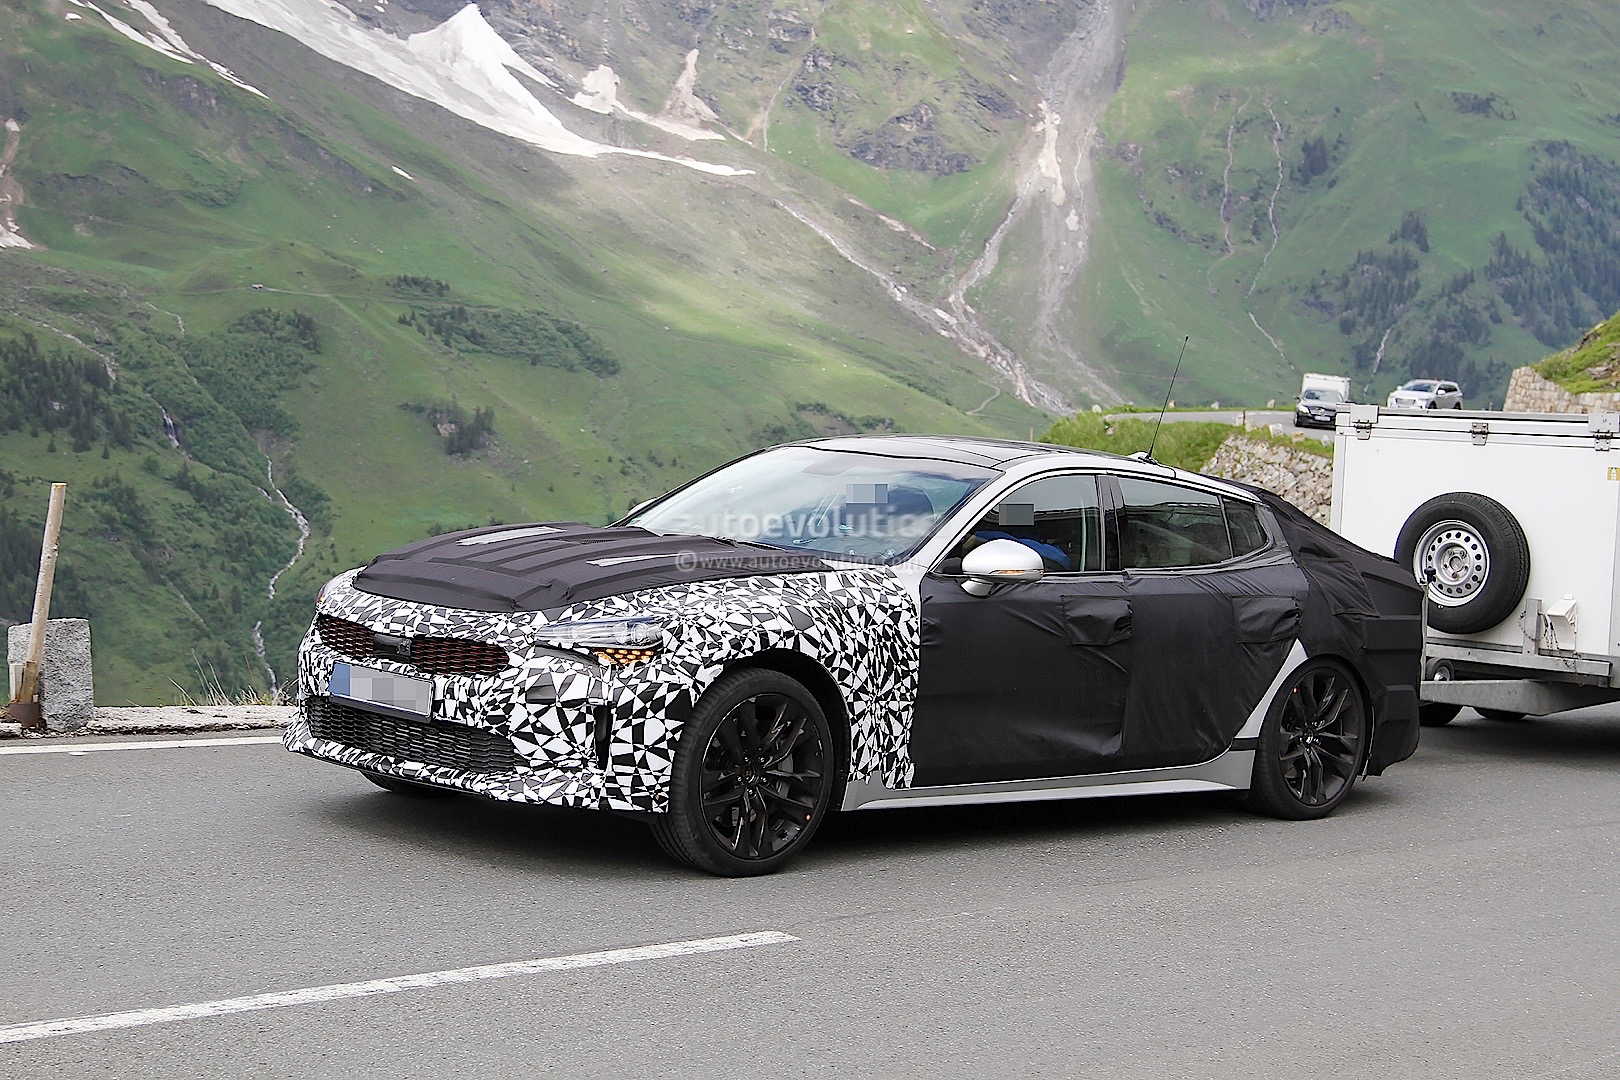 2018 Kia Gt Spied Towing Cargo Trailer In The Alps Autoevolution Front Hitch Sorento 13 Photos